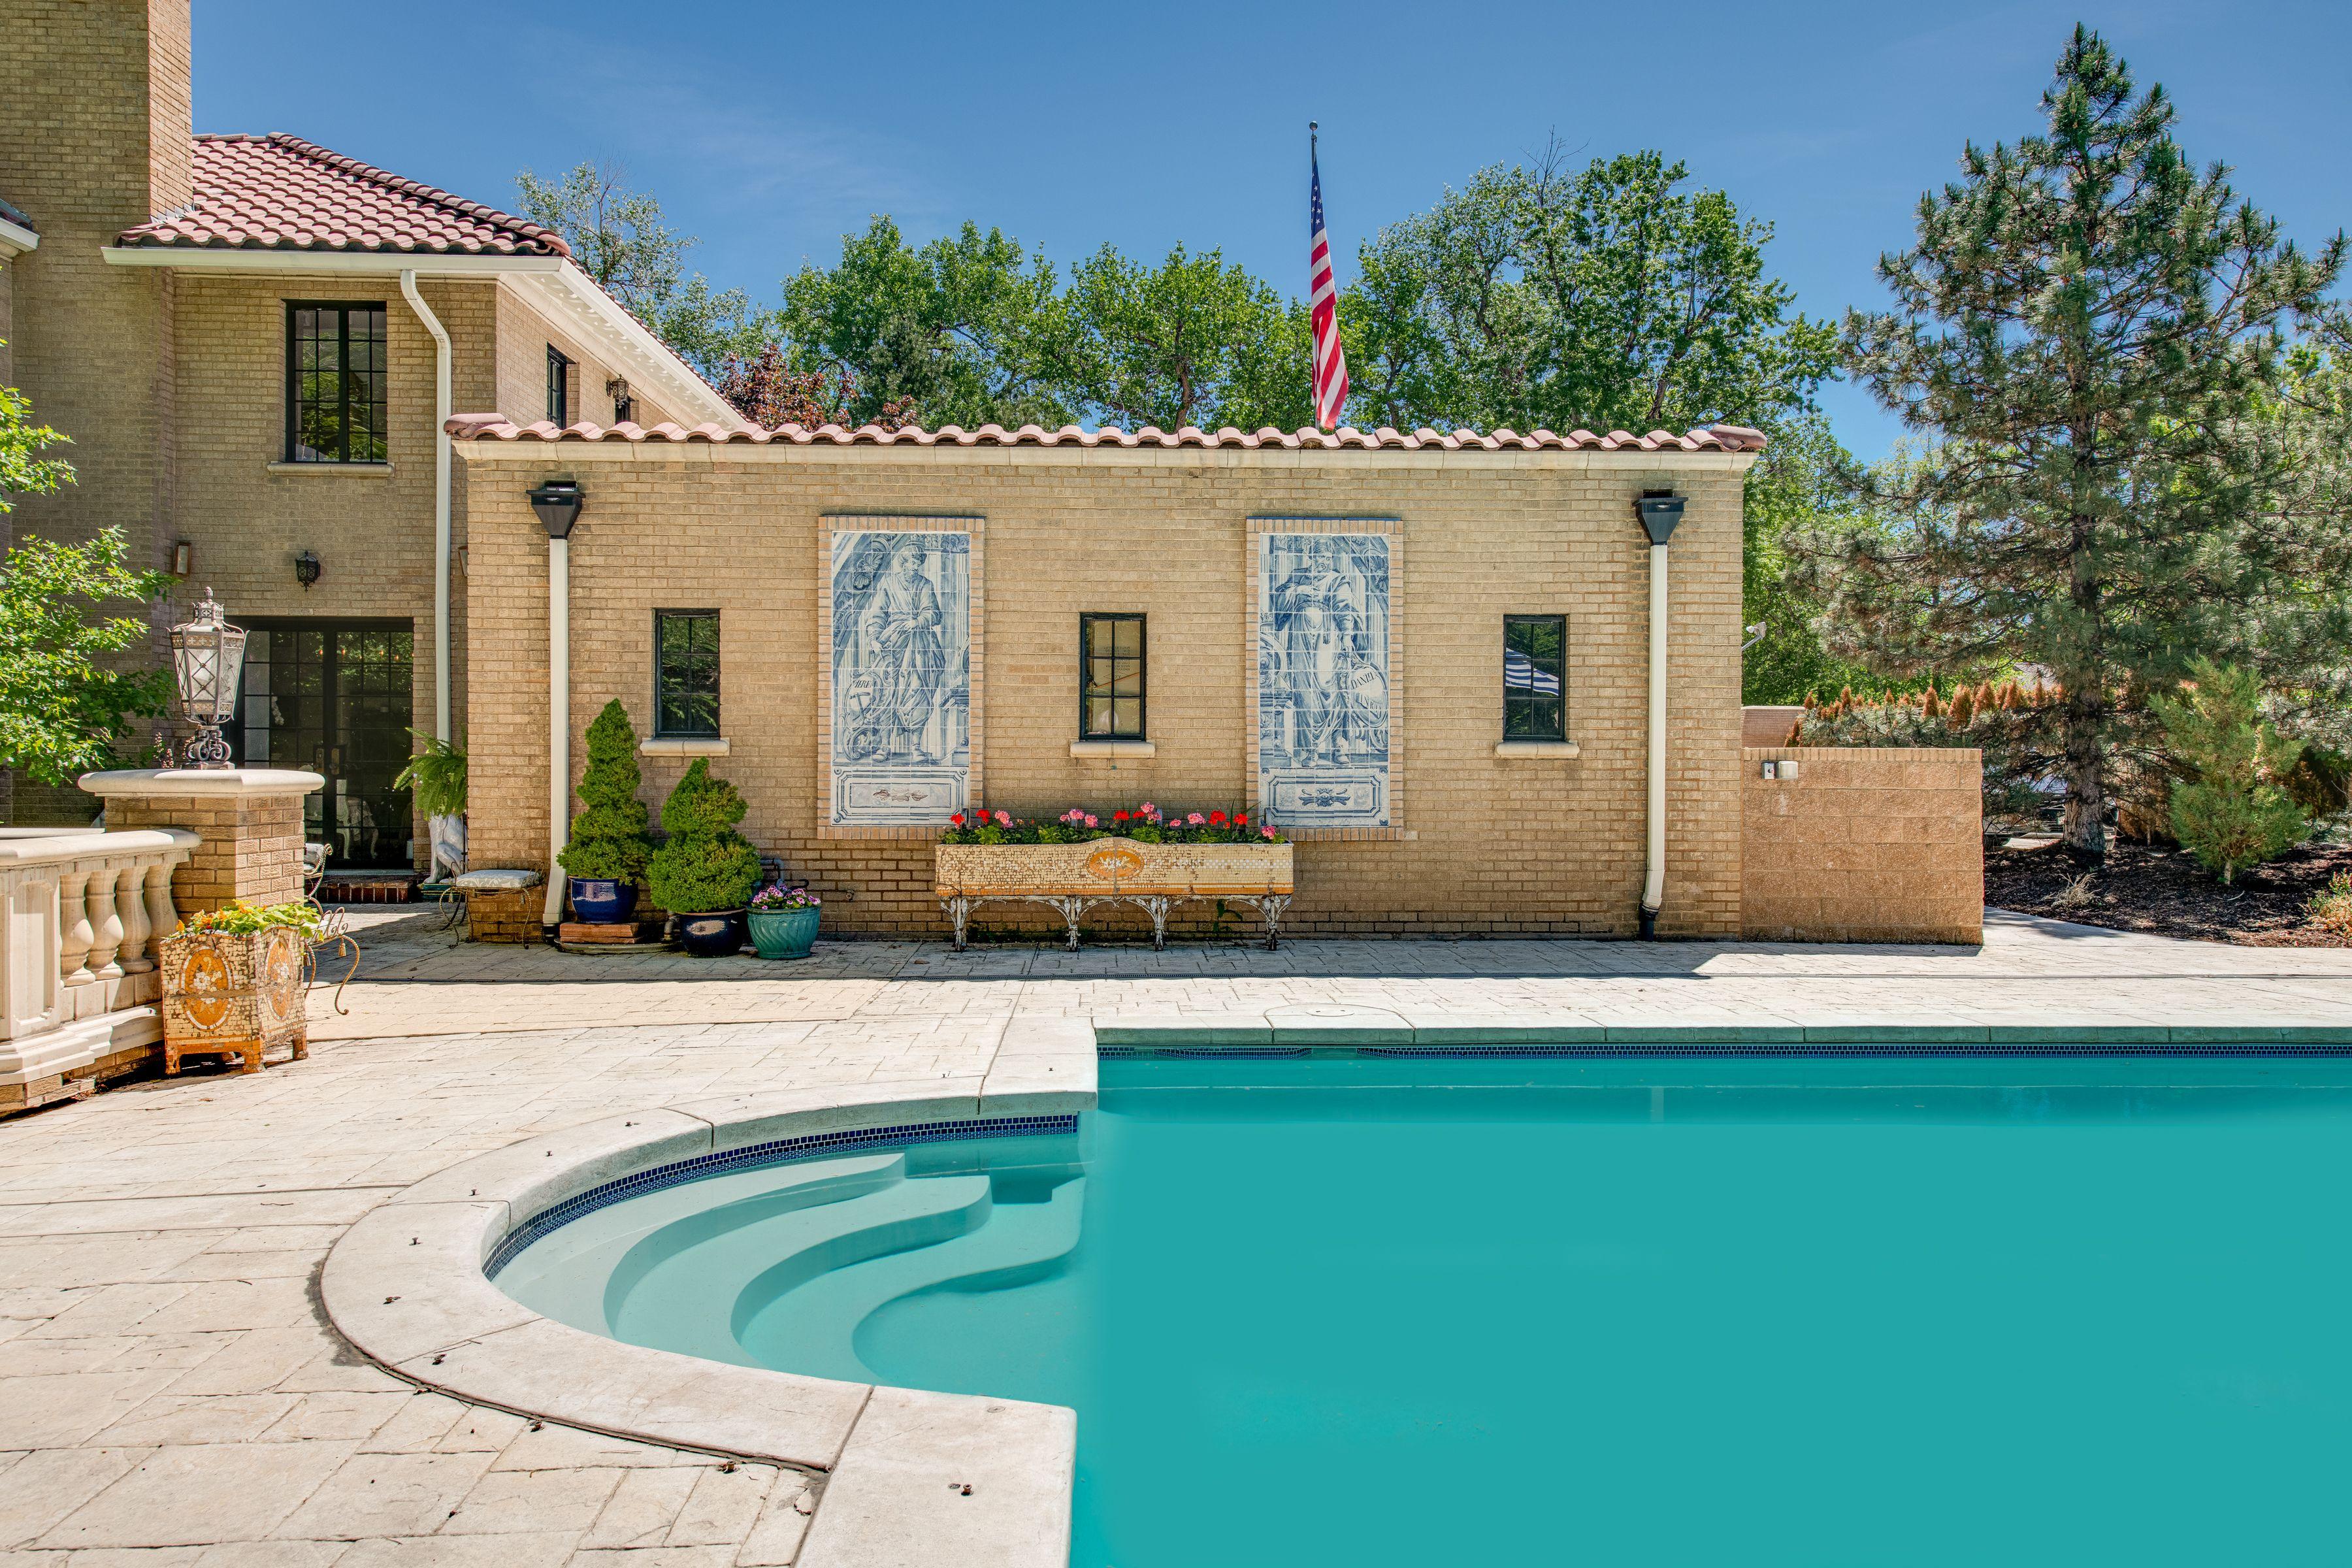 3125 E. Exposition pool